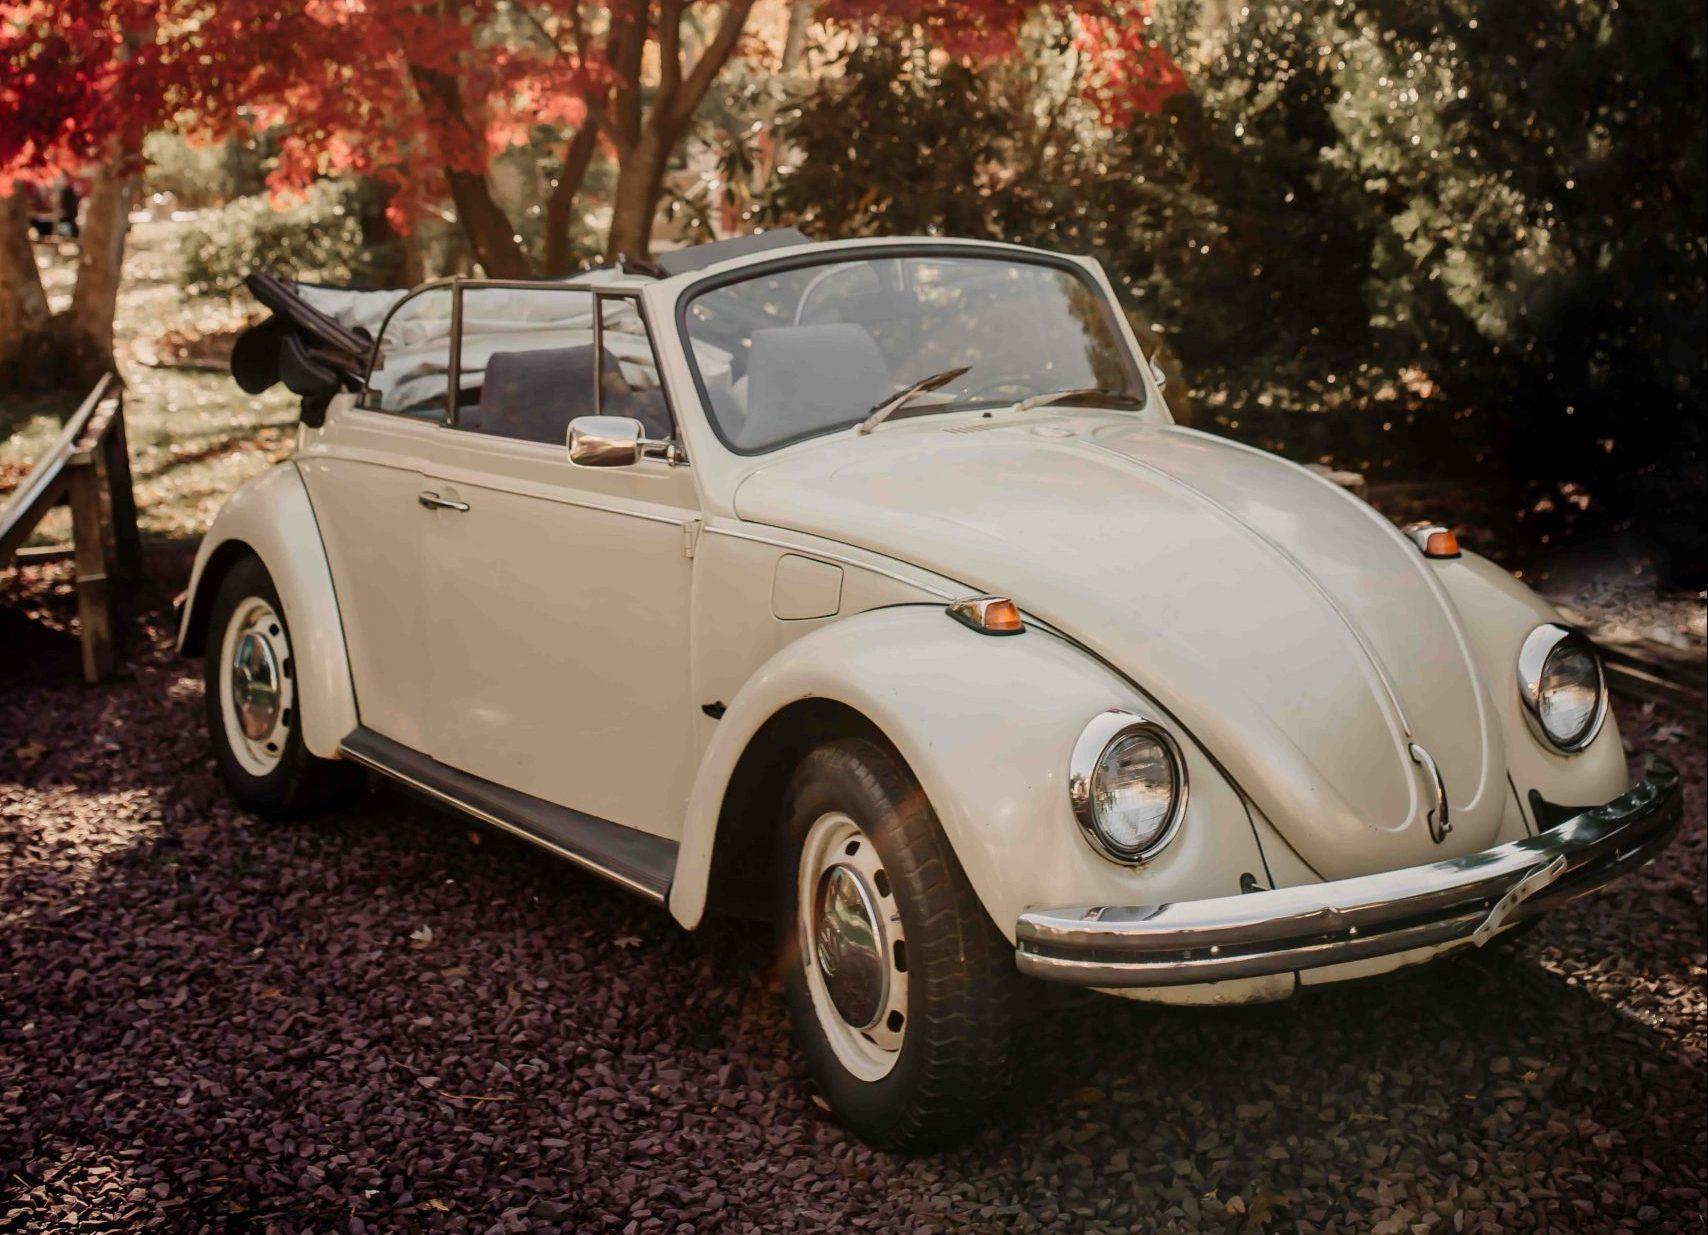 vintage cream-color Volkswagen Beetle